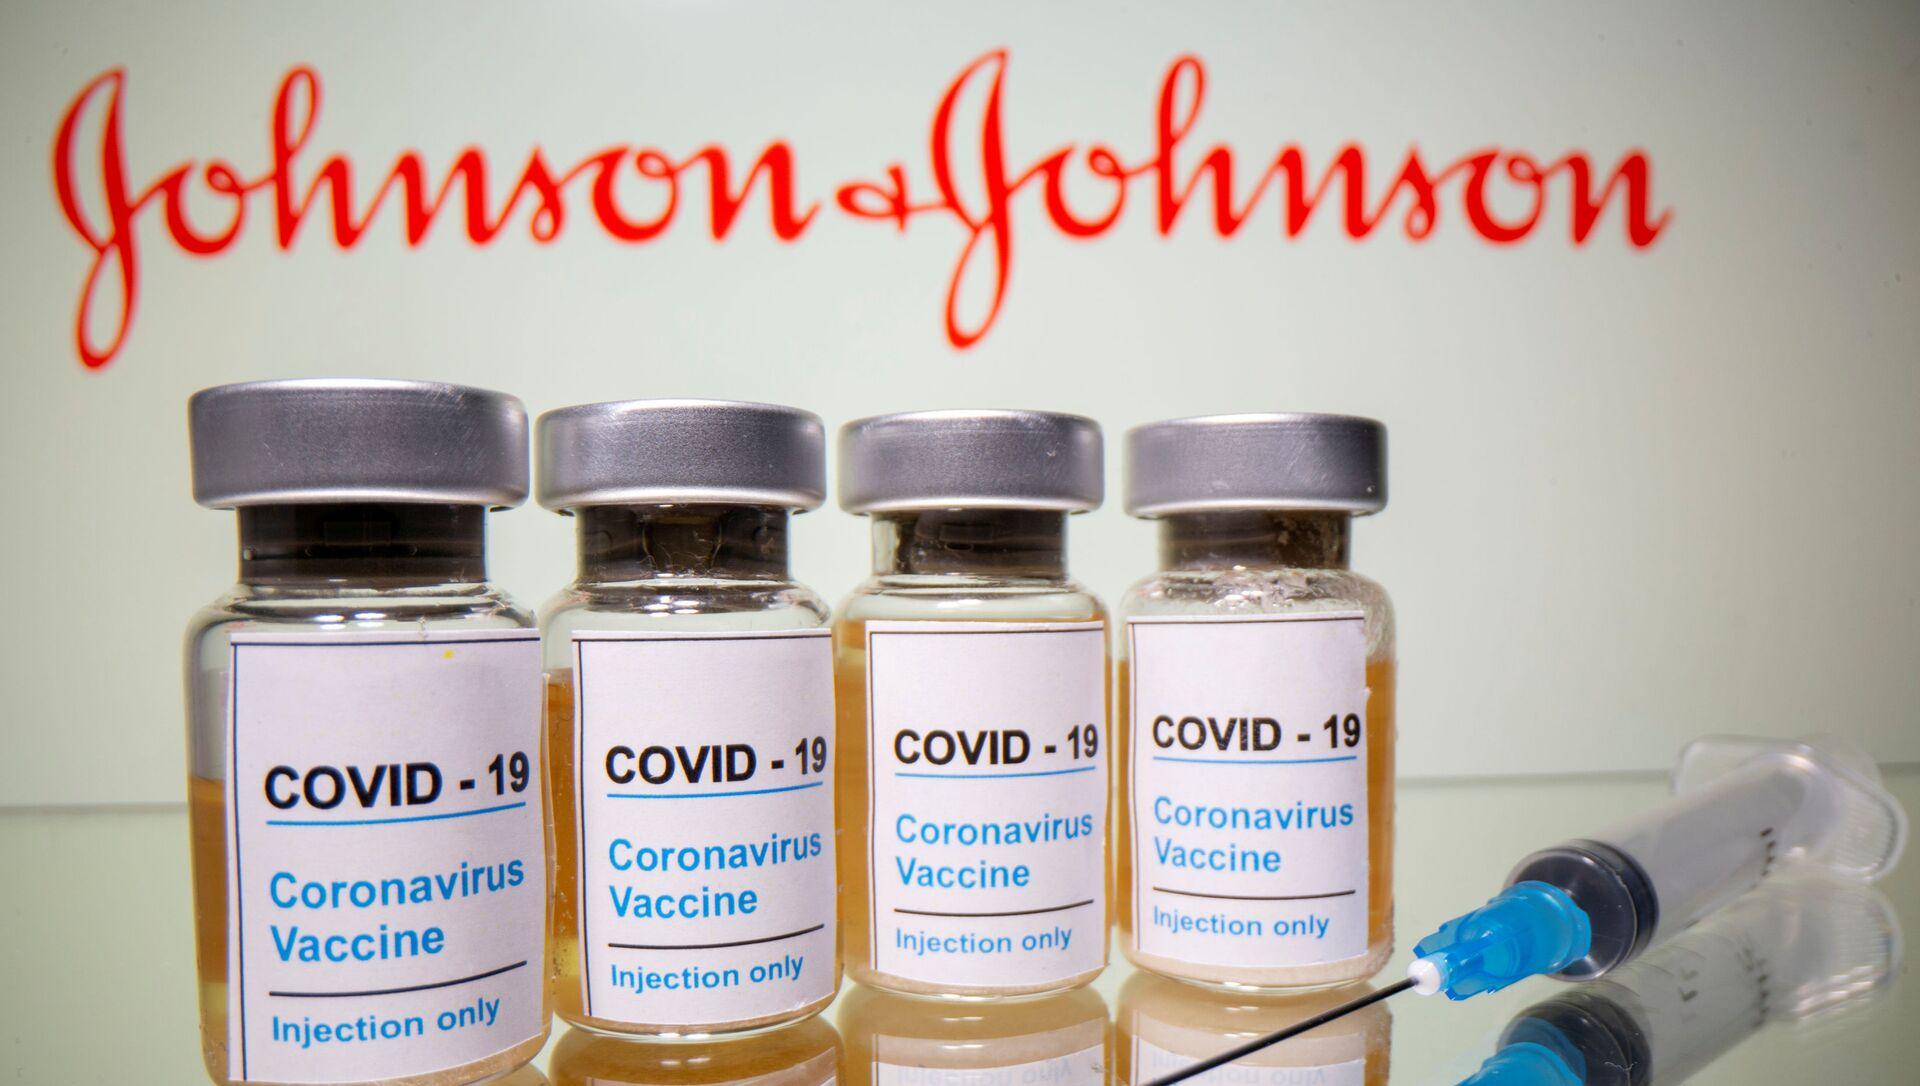 Вакцина и логотип компании Johnson & Johnson - Sputnik Italia, 1920, 05.02.2021